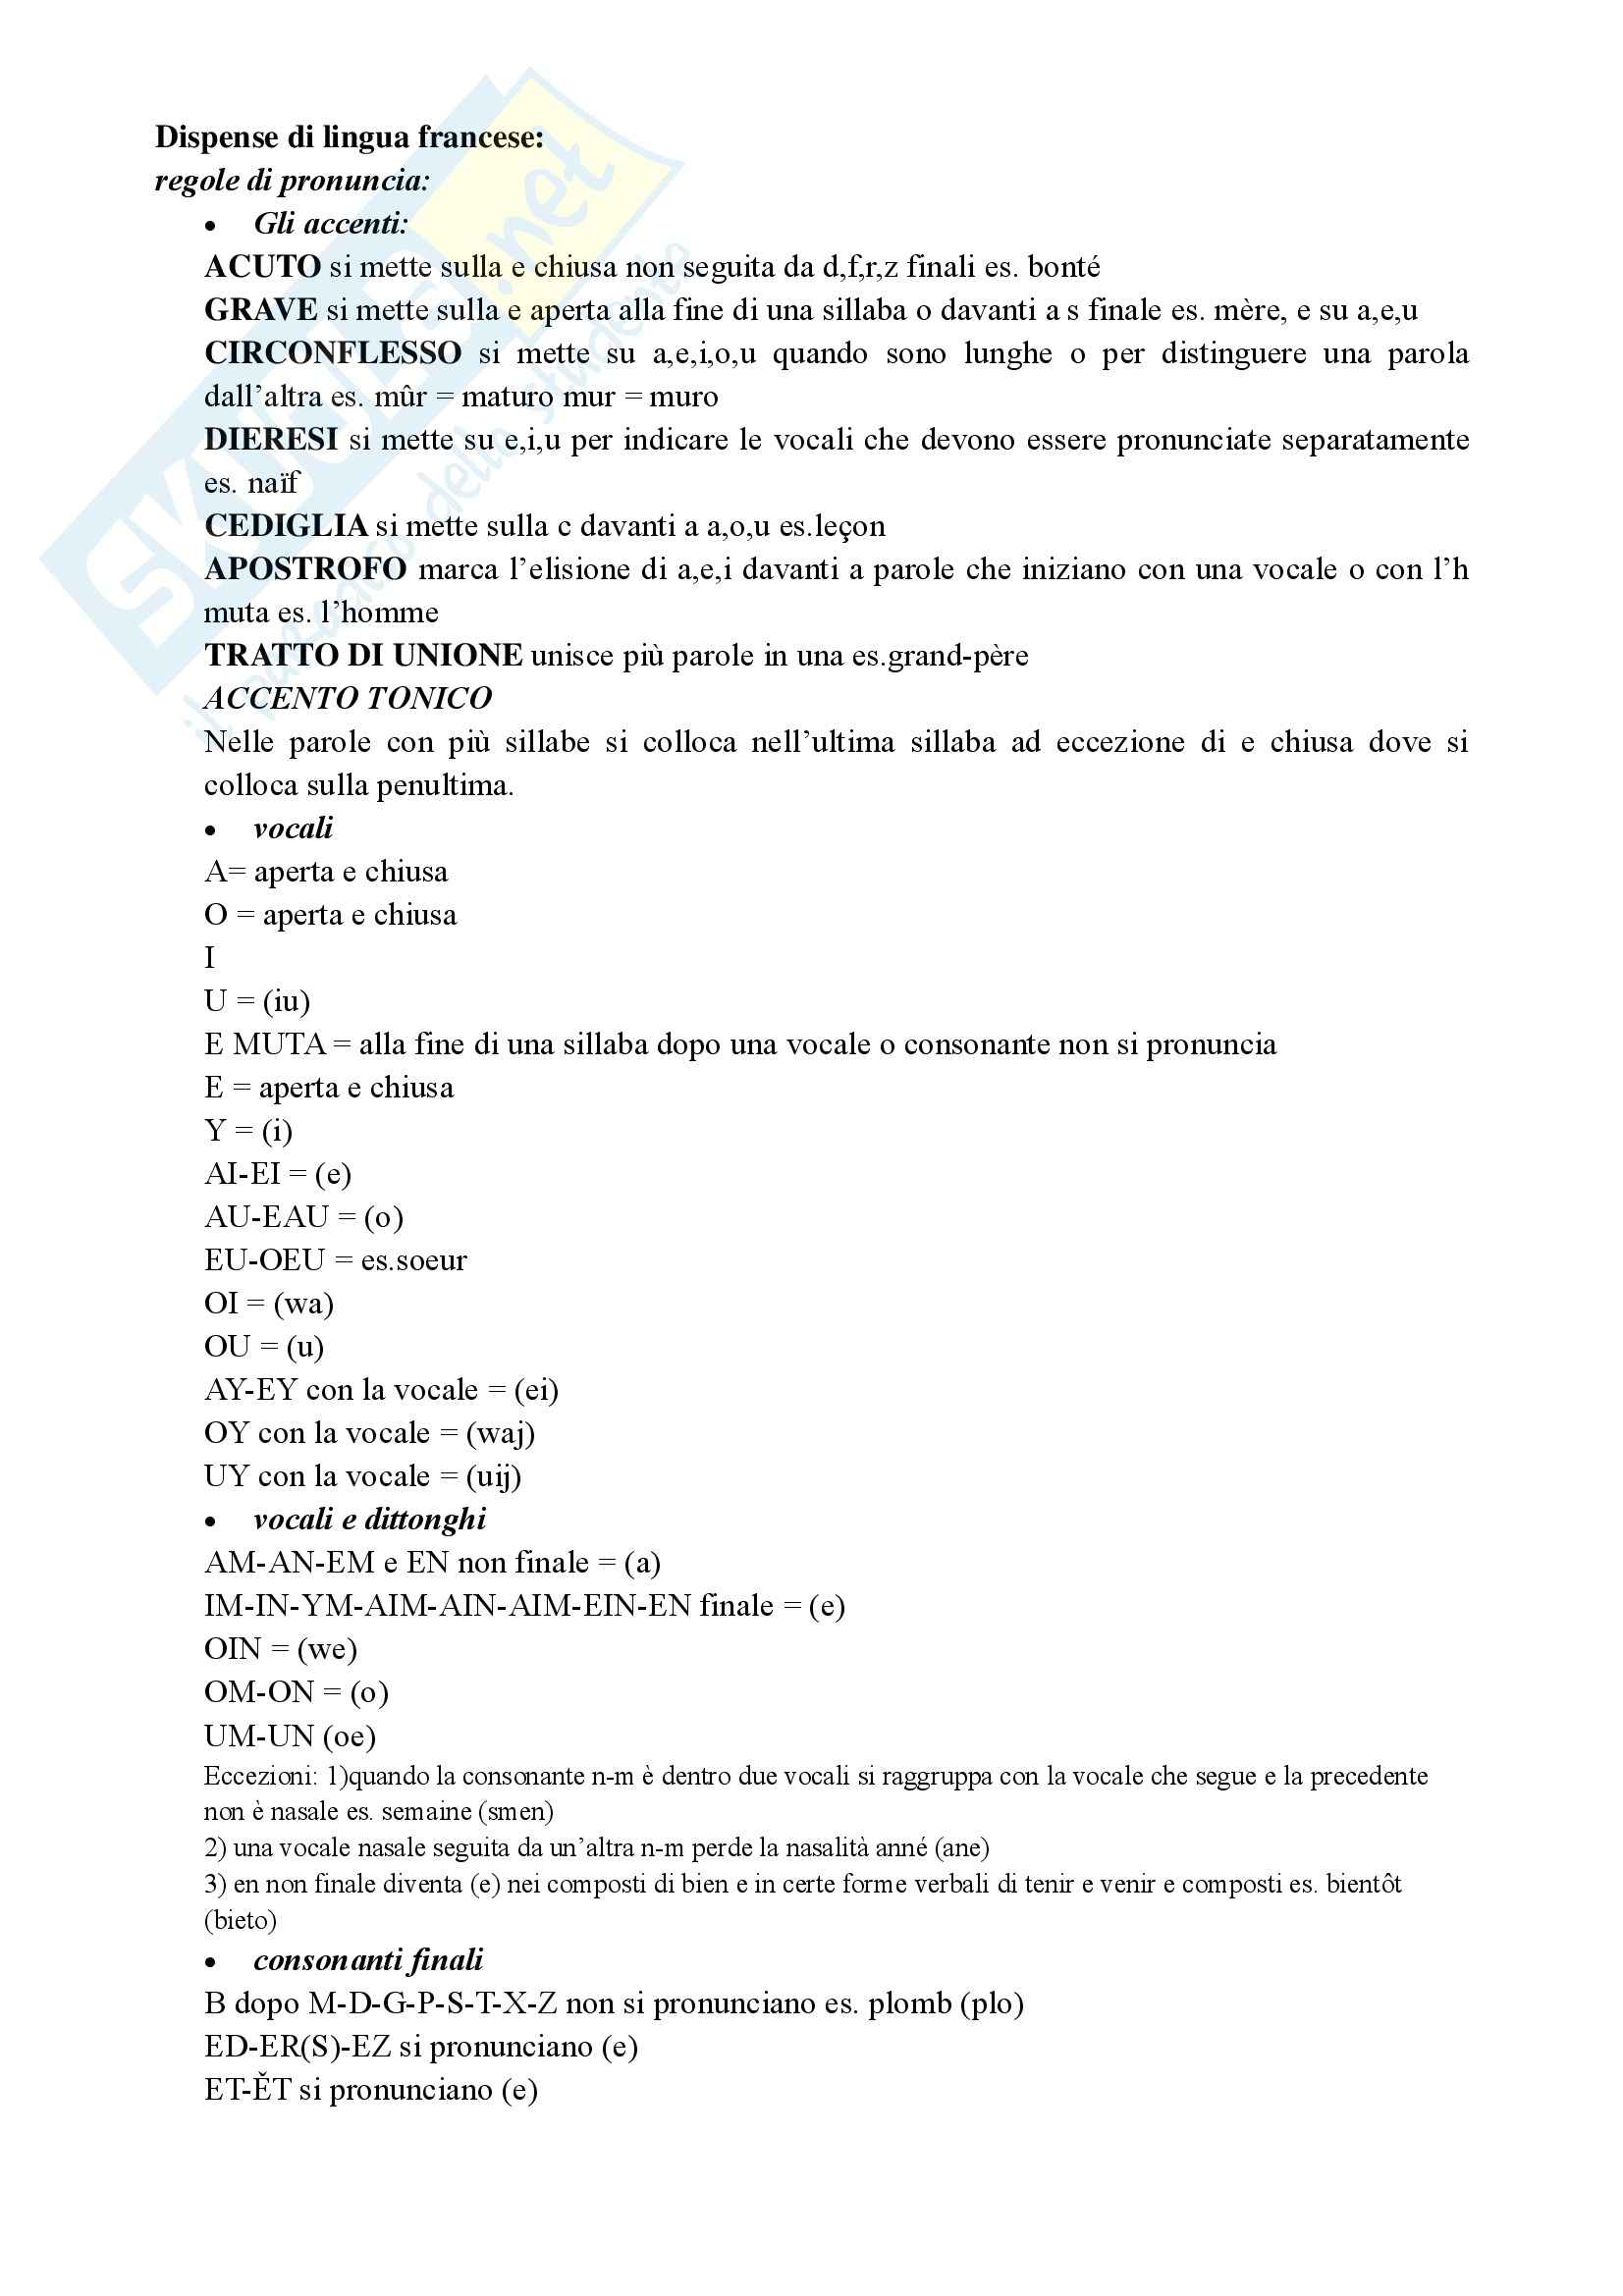 Grammatica francese riassunto esame prof splendori for Accenti francesi